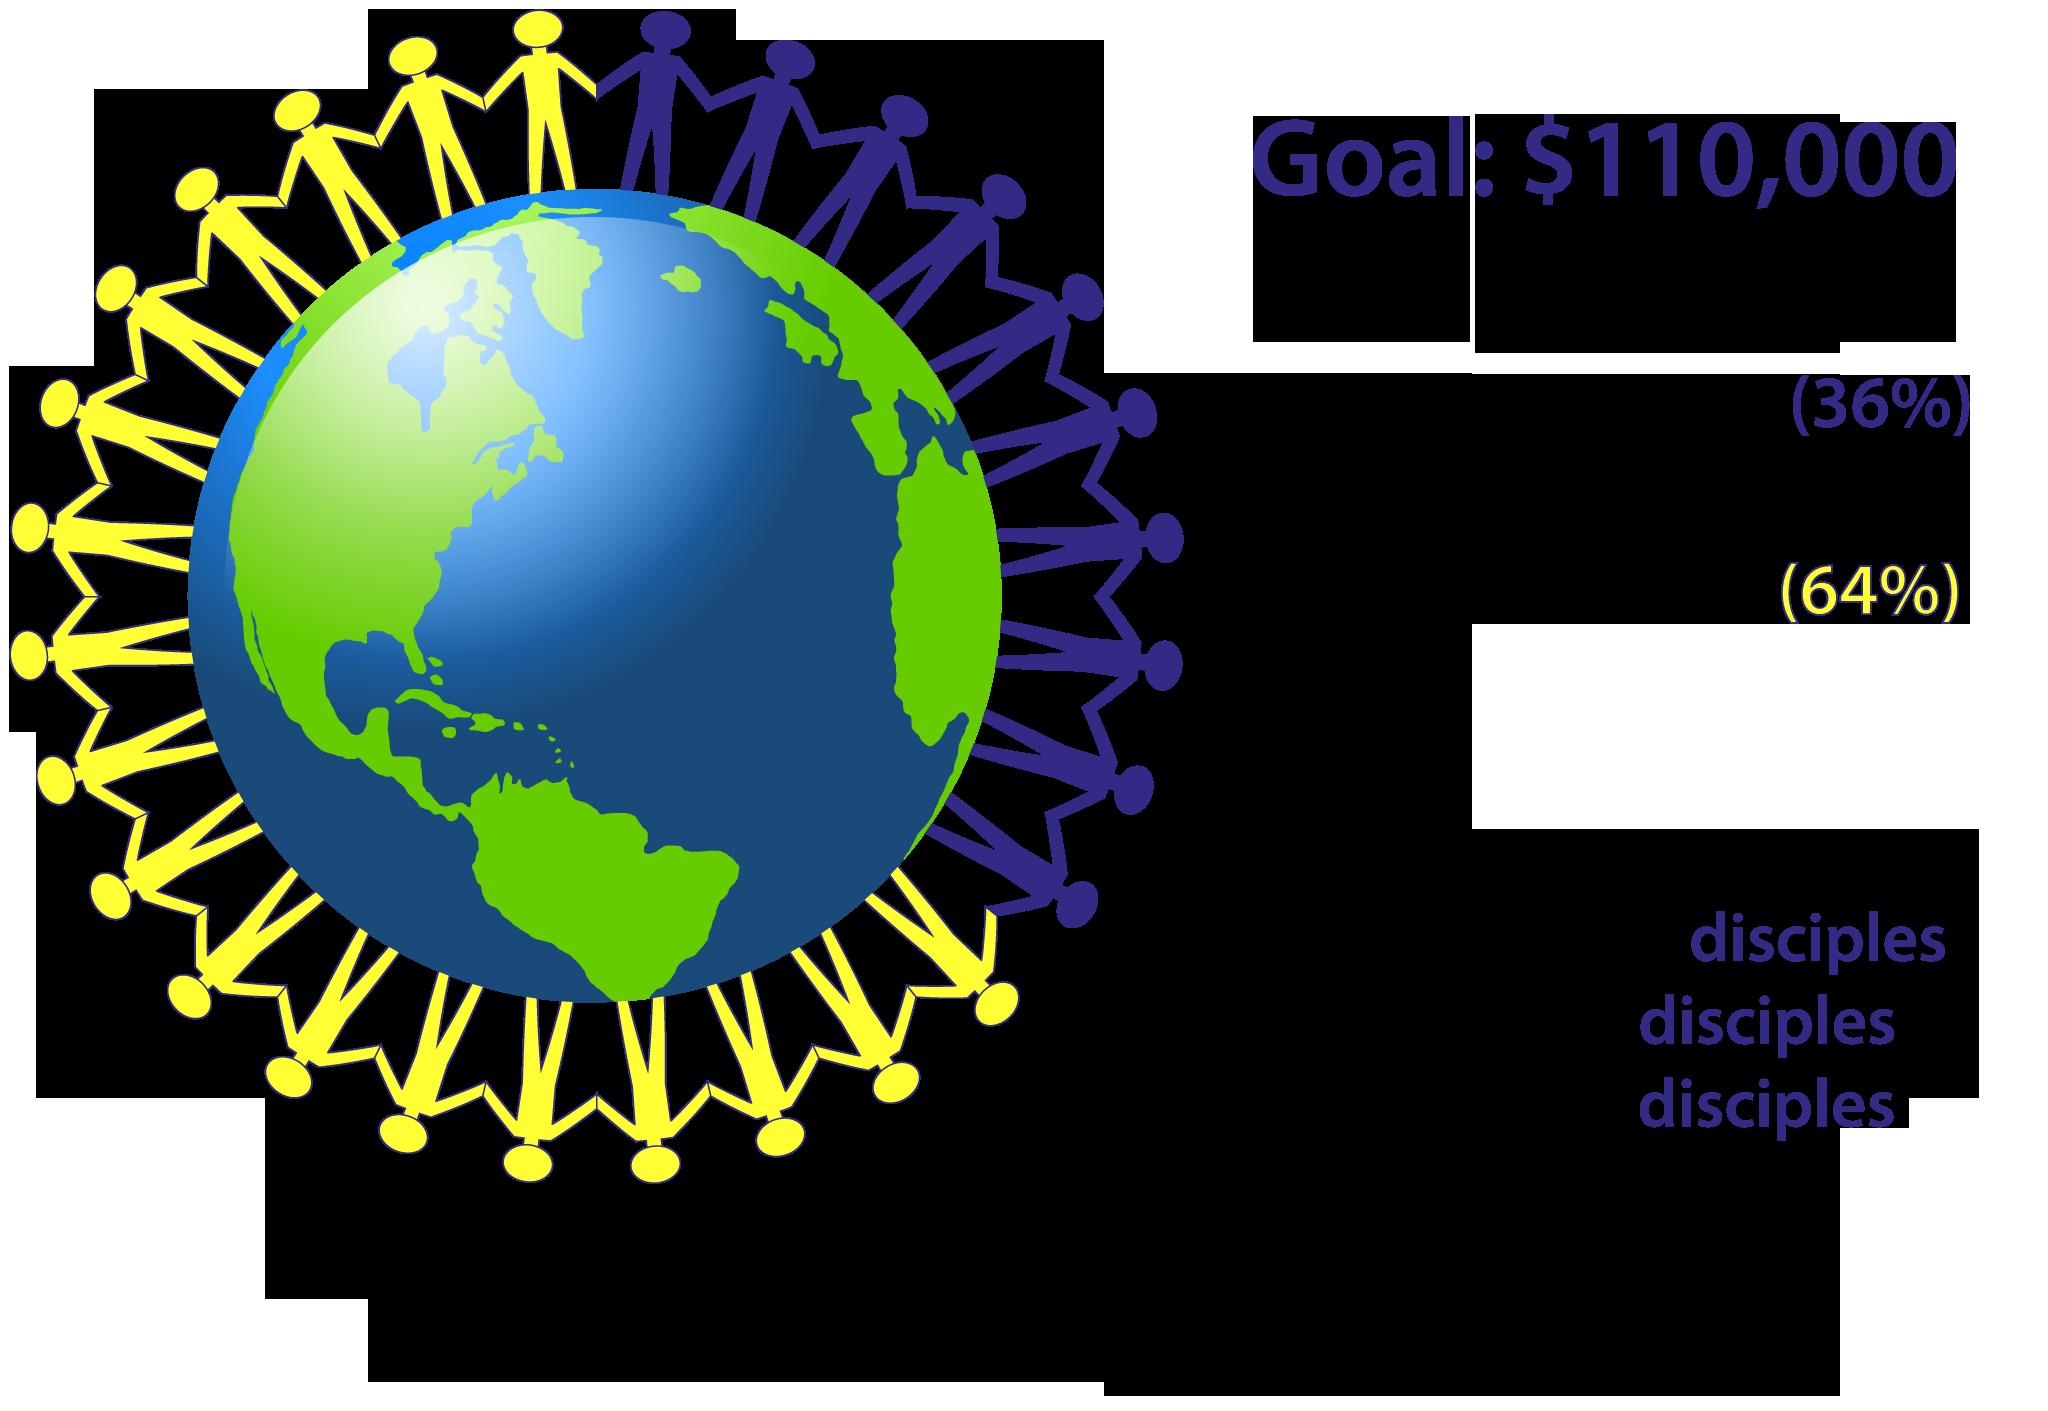 Mission Fund campaign update